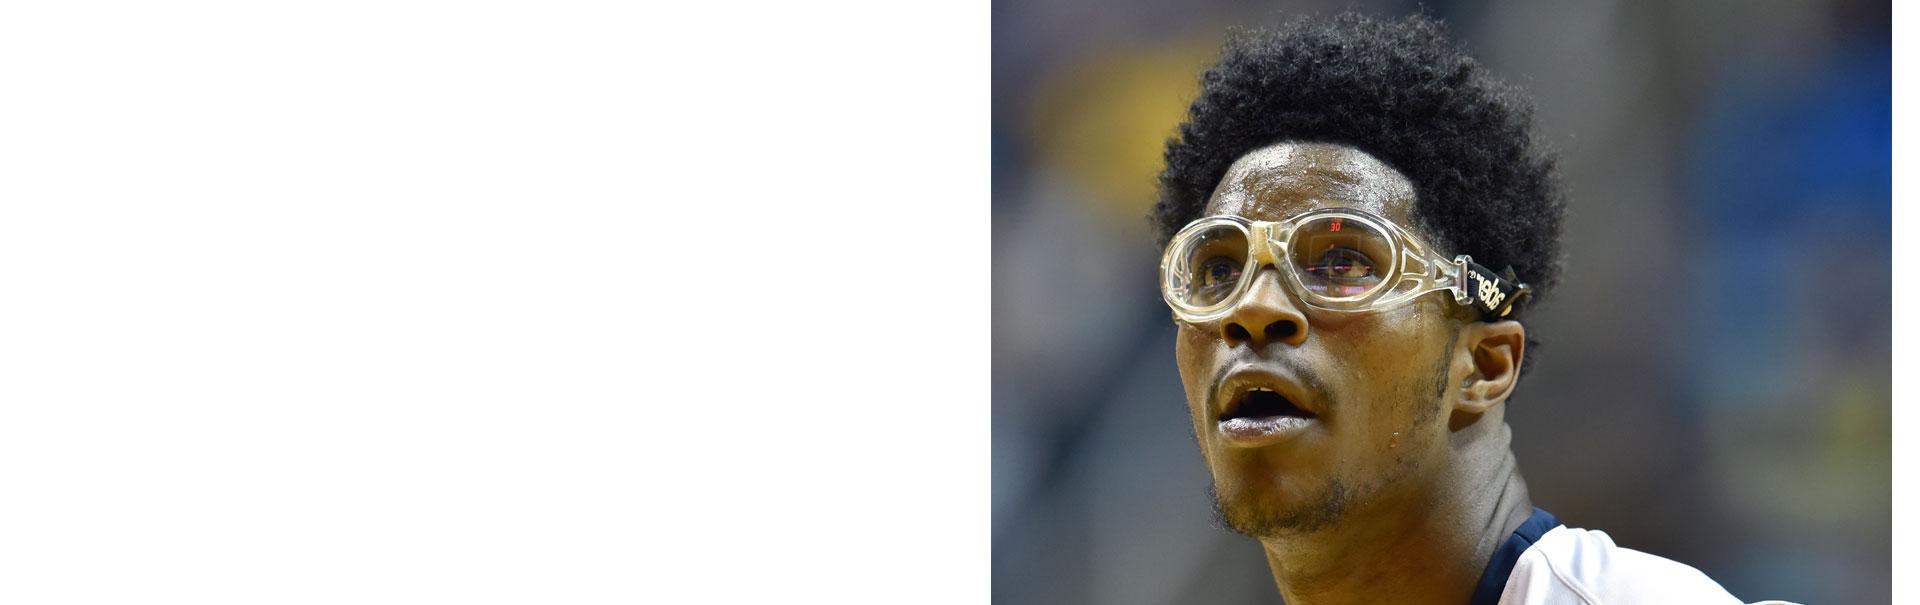 Basketball Glasses